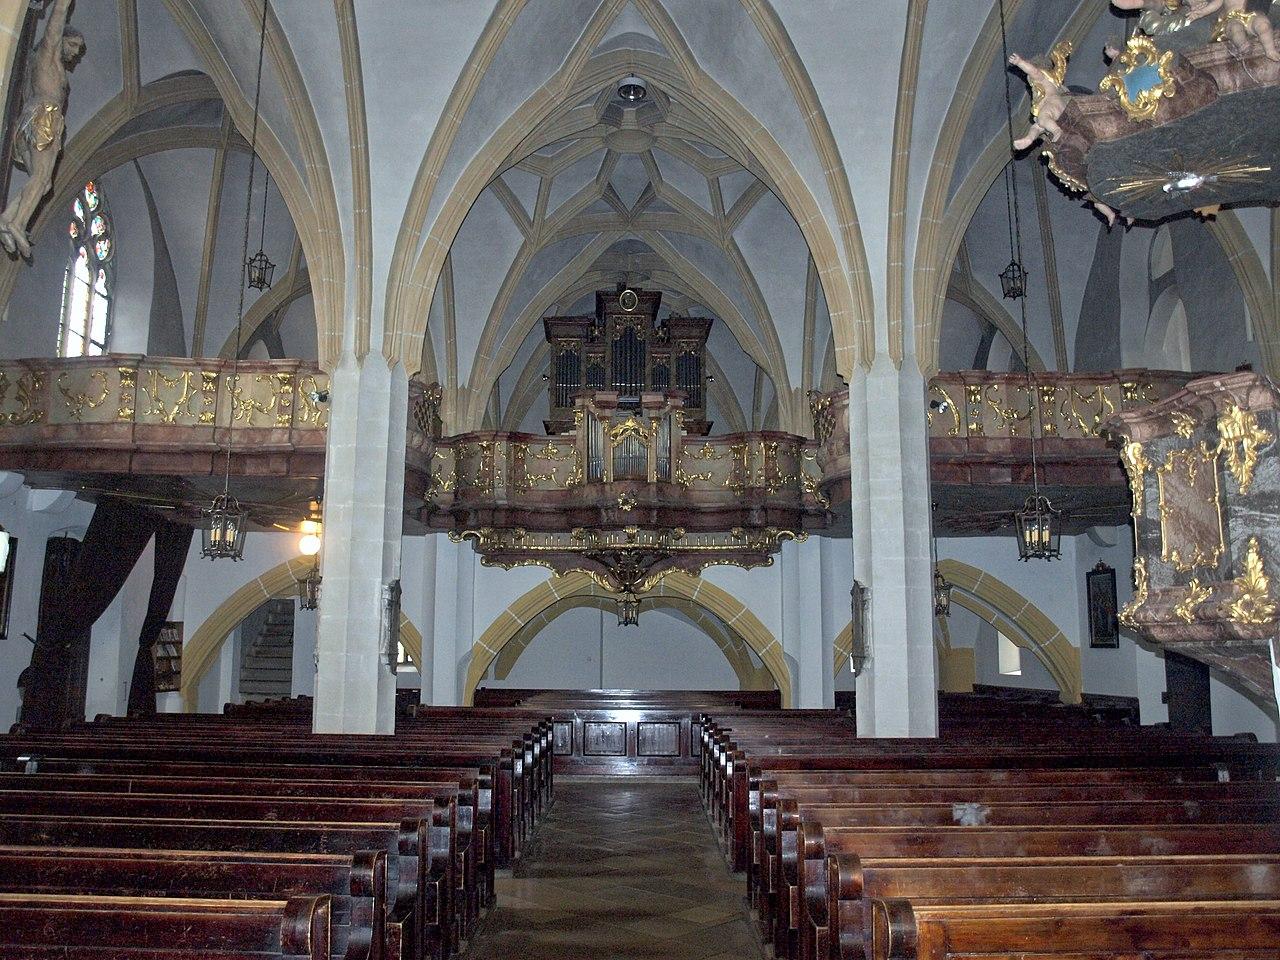 1280px-2012.10.21_-_Strengberg_Pfarrkirche_Mariae_Himmelfahrt_-_11.jpg